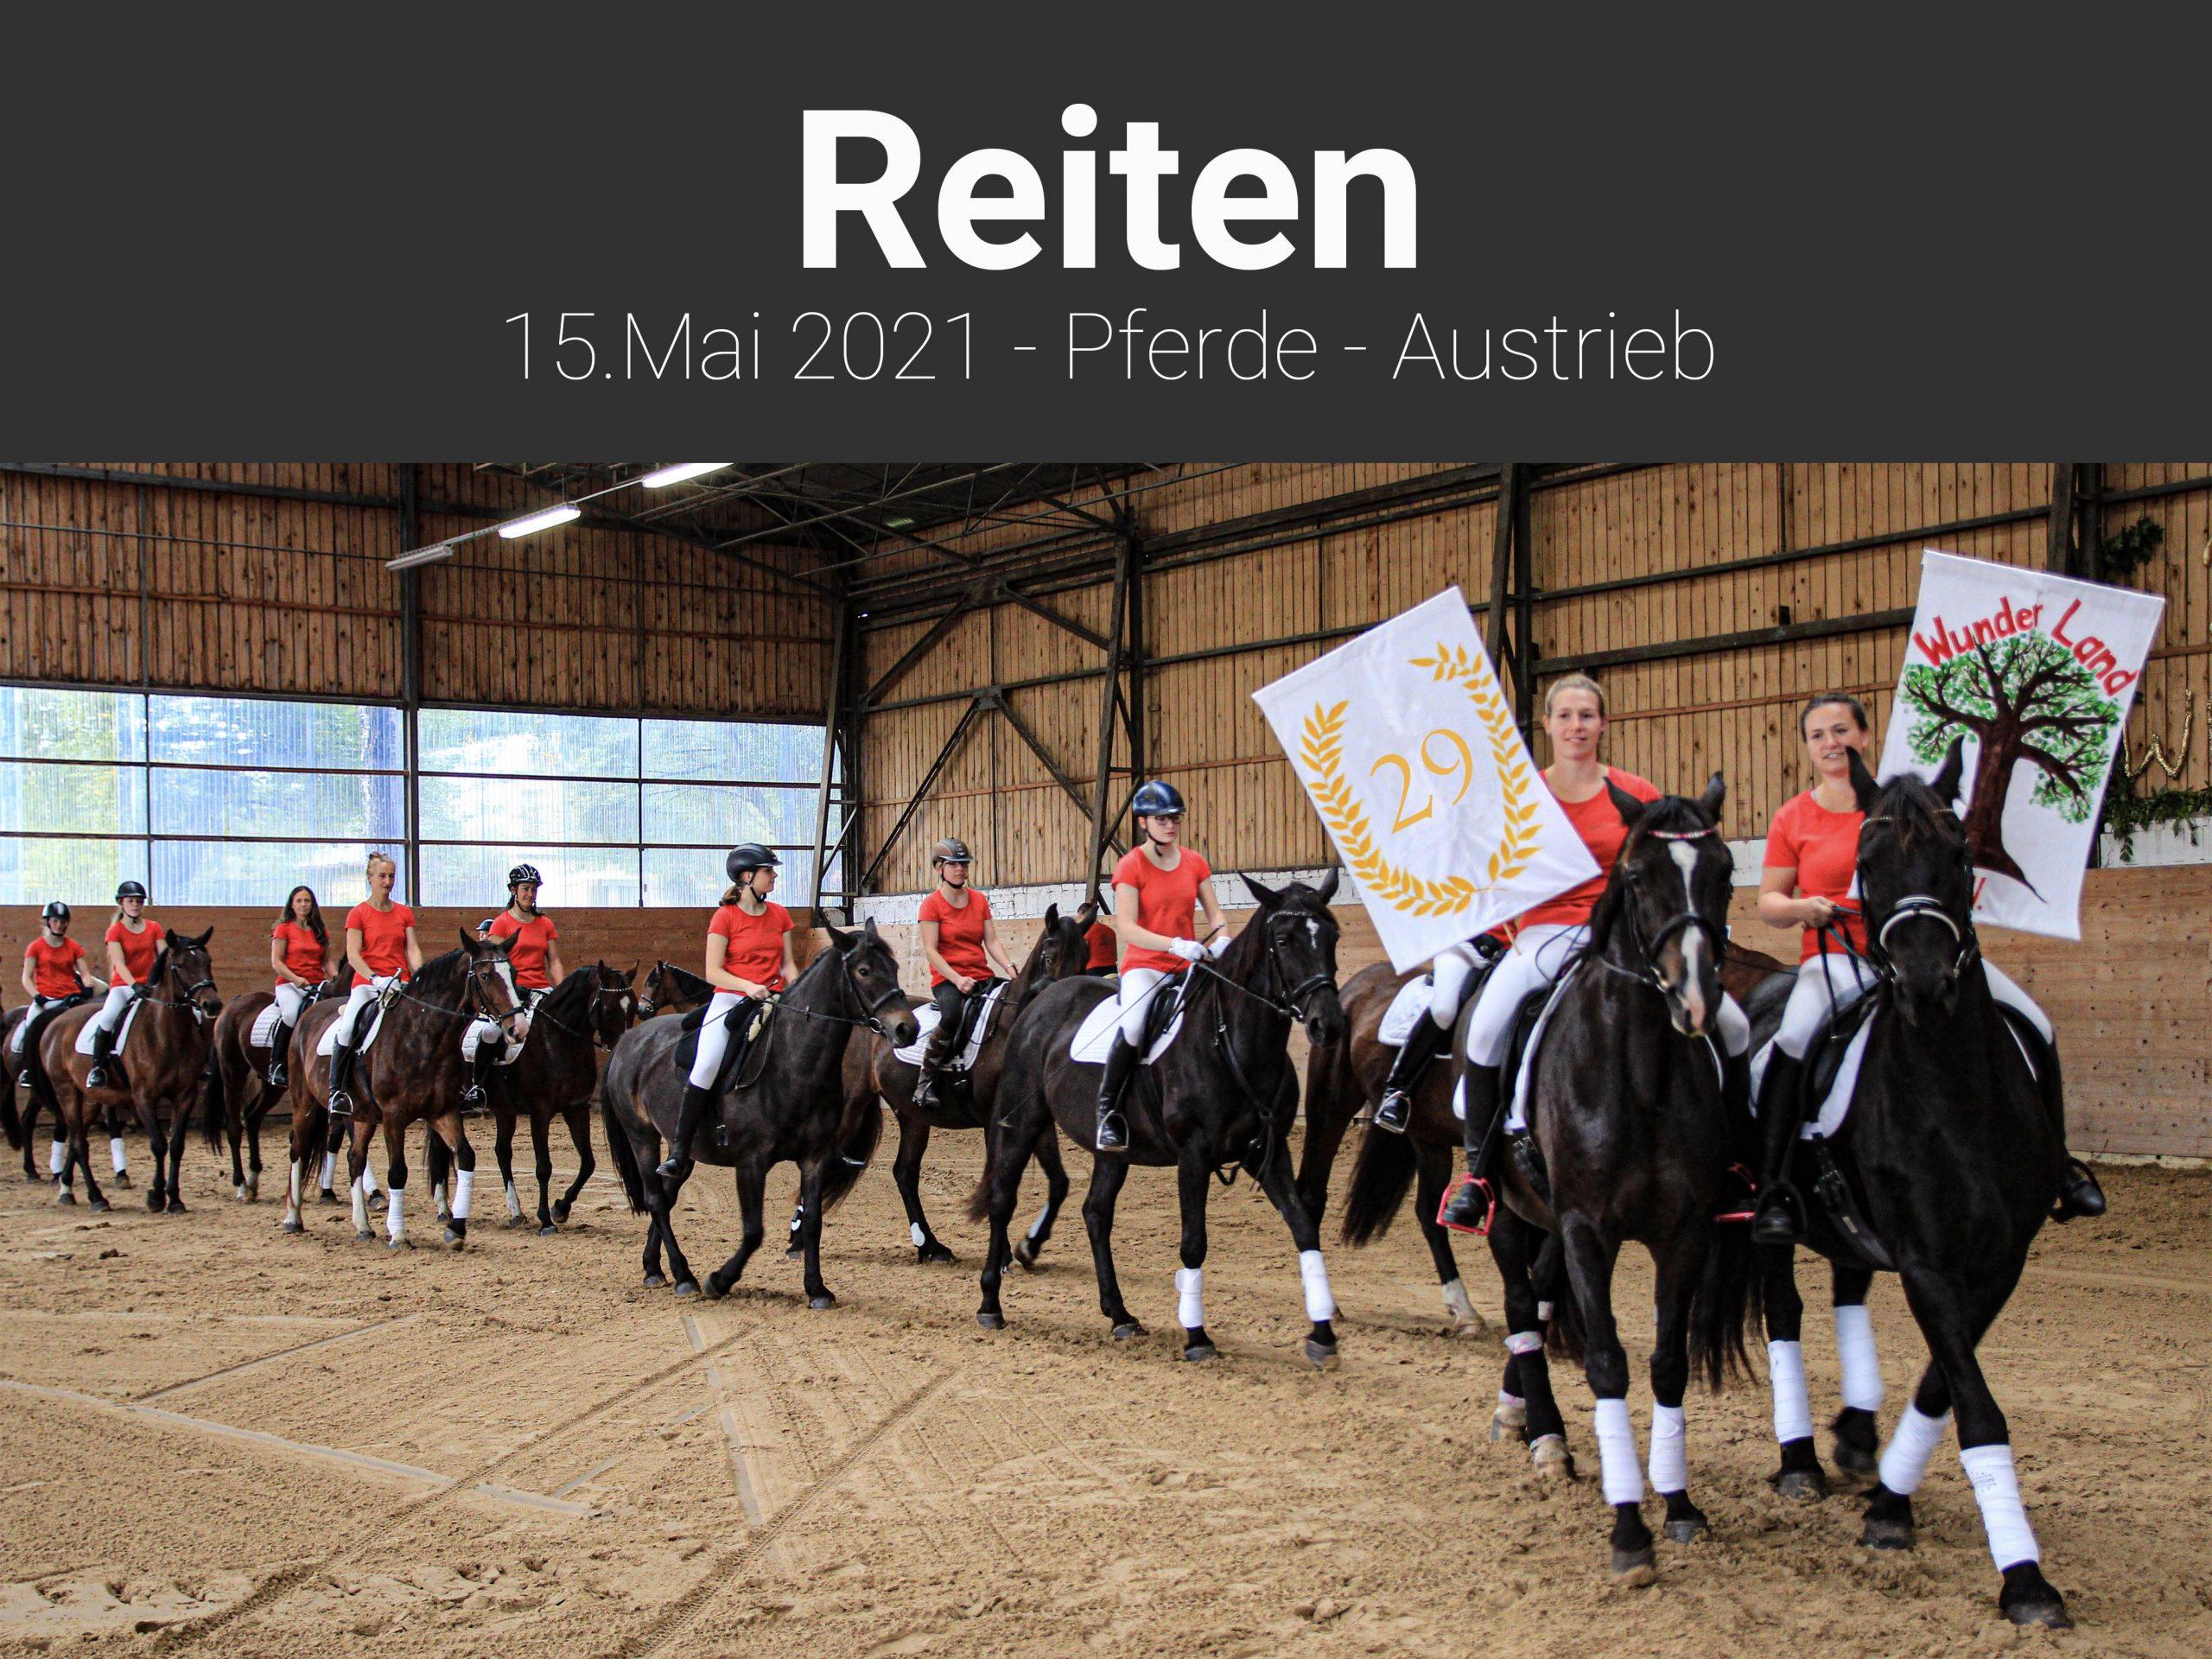 Reiten-Pferdeaustrieb